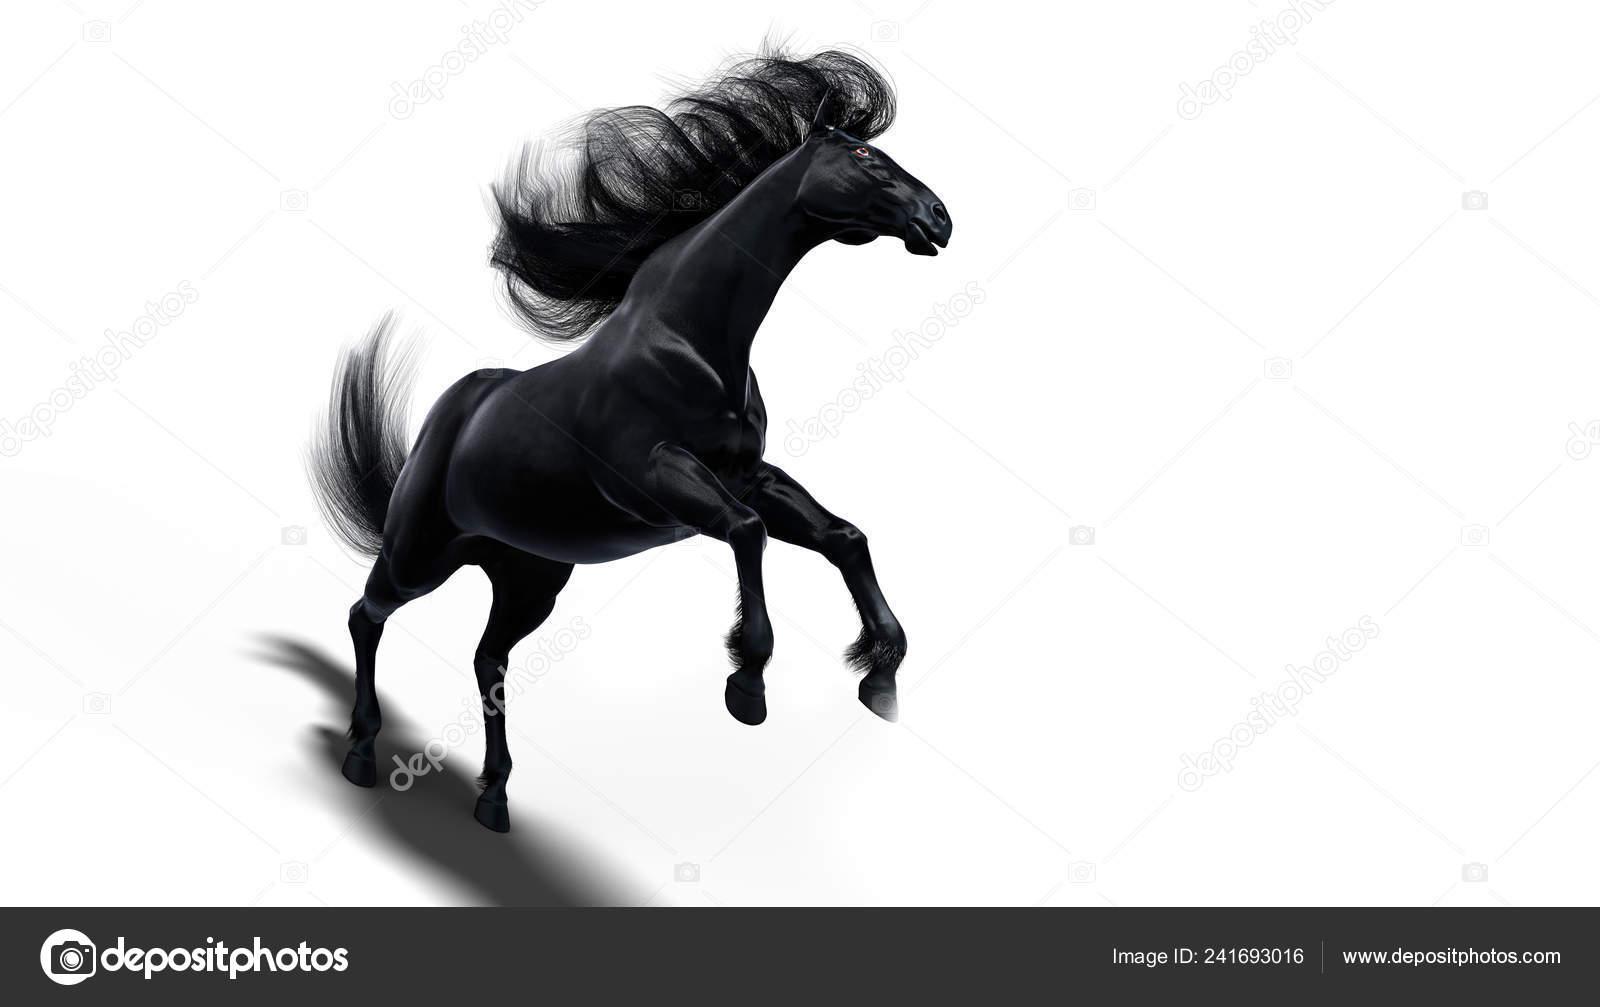 Black Running Horse White Background Isolated Illustration Stock Photo C Vitaliy Sokol 241693016